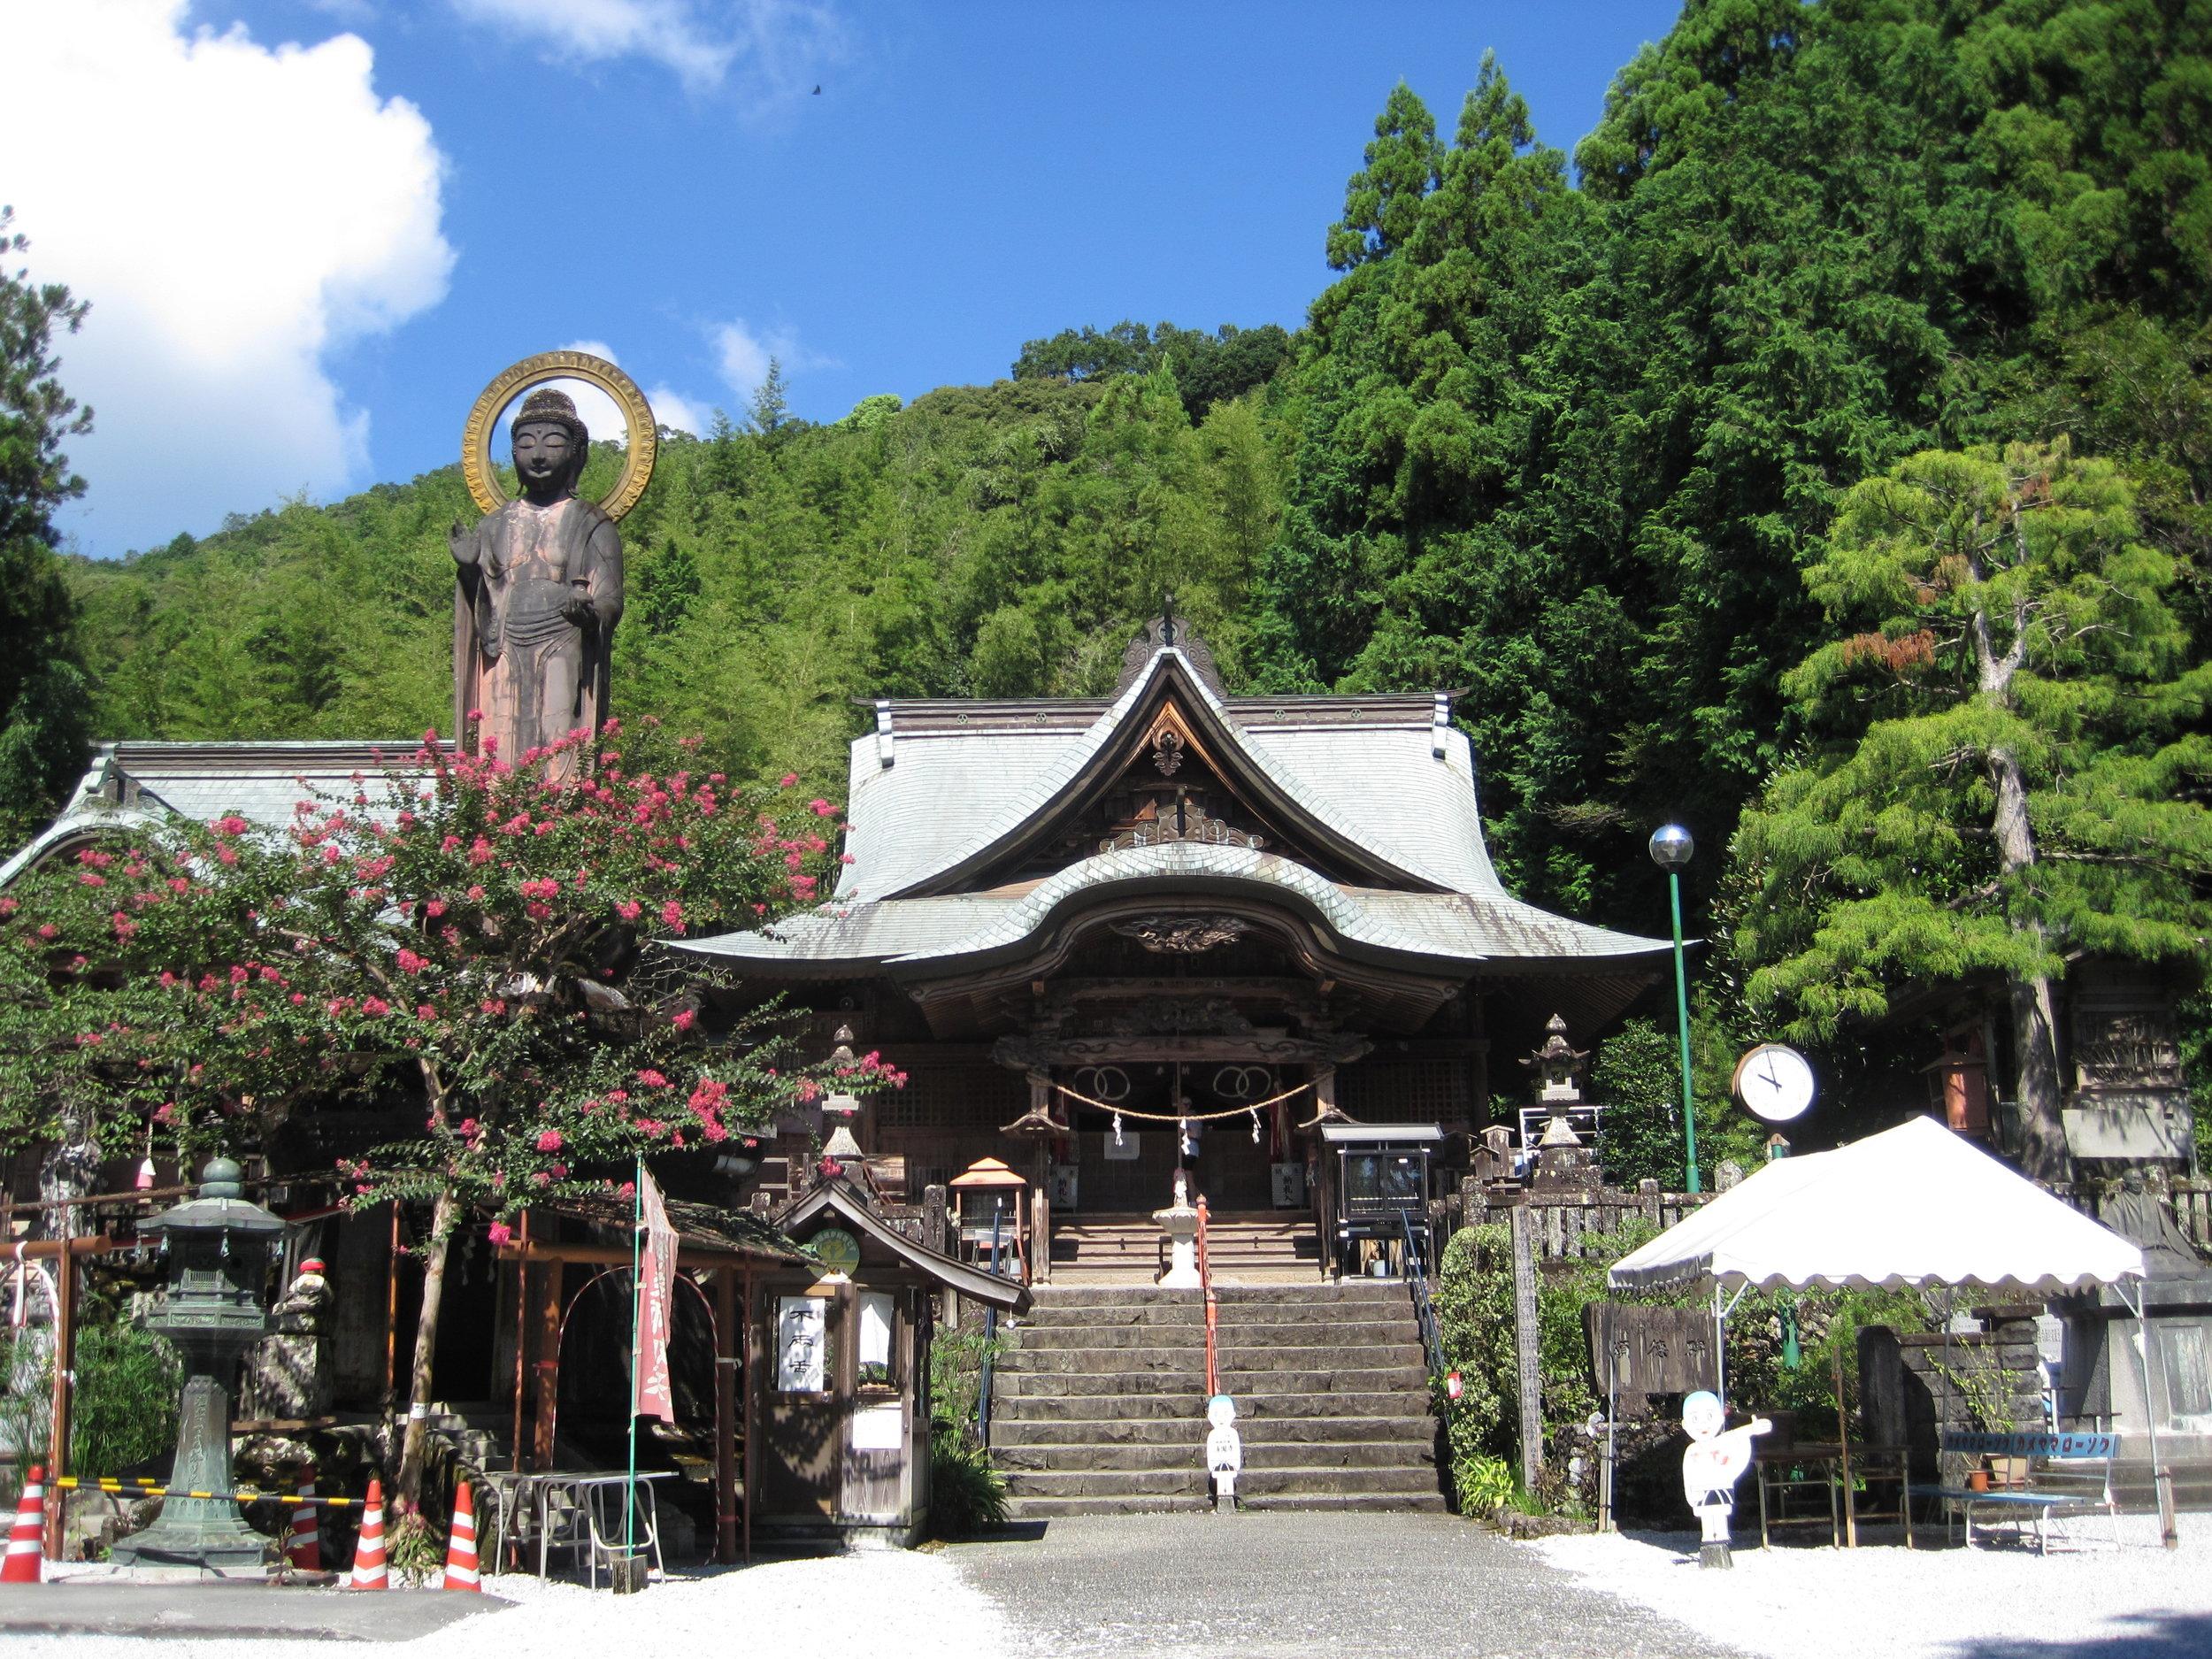 October, 2016: The Shikoku Pilgrimage